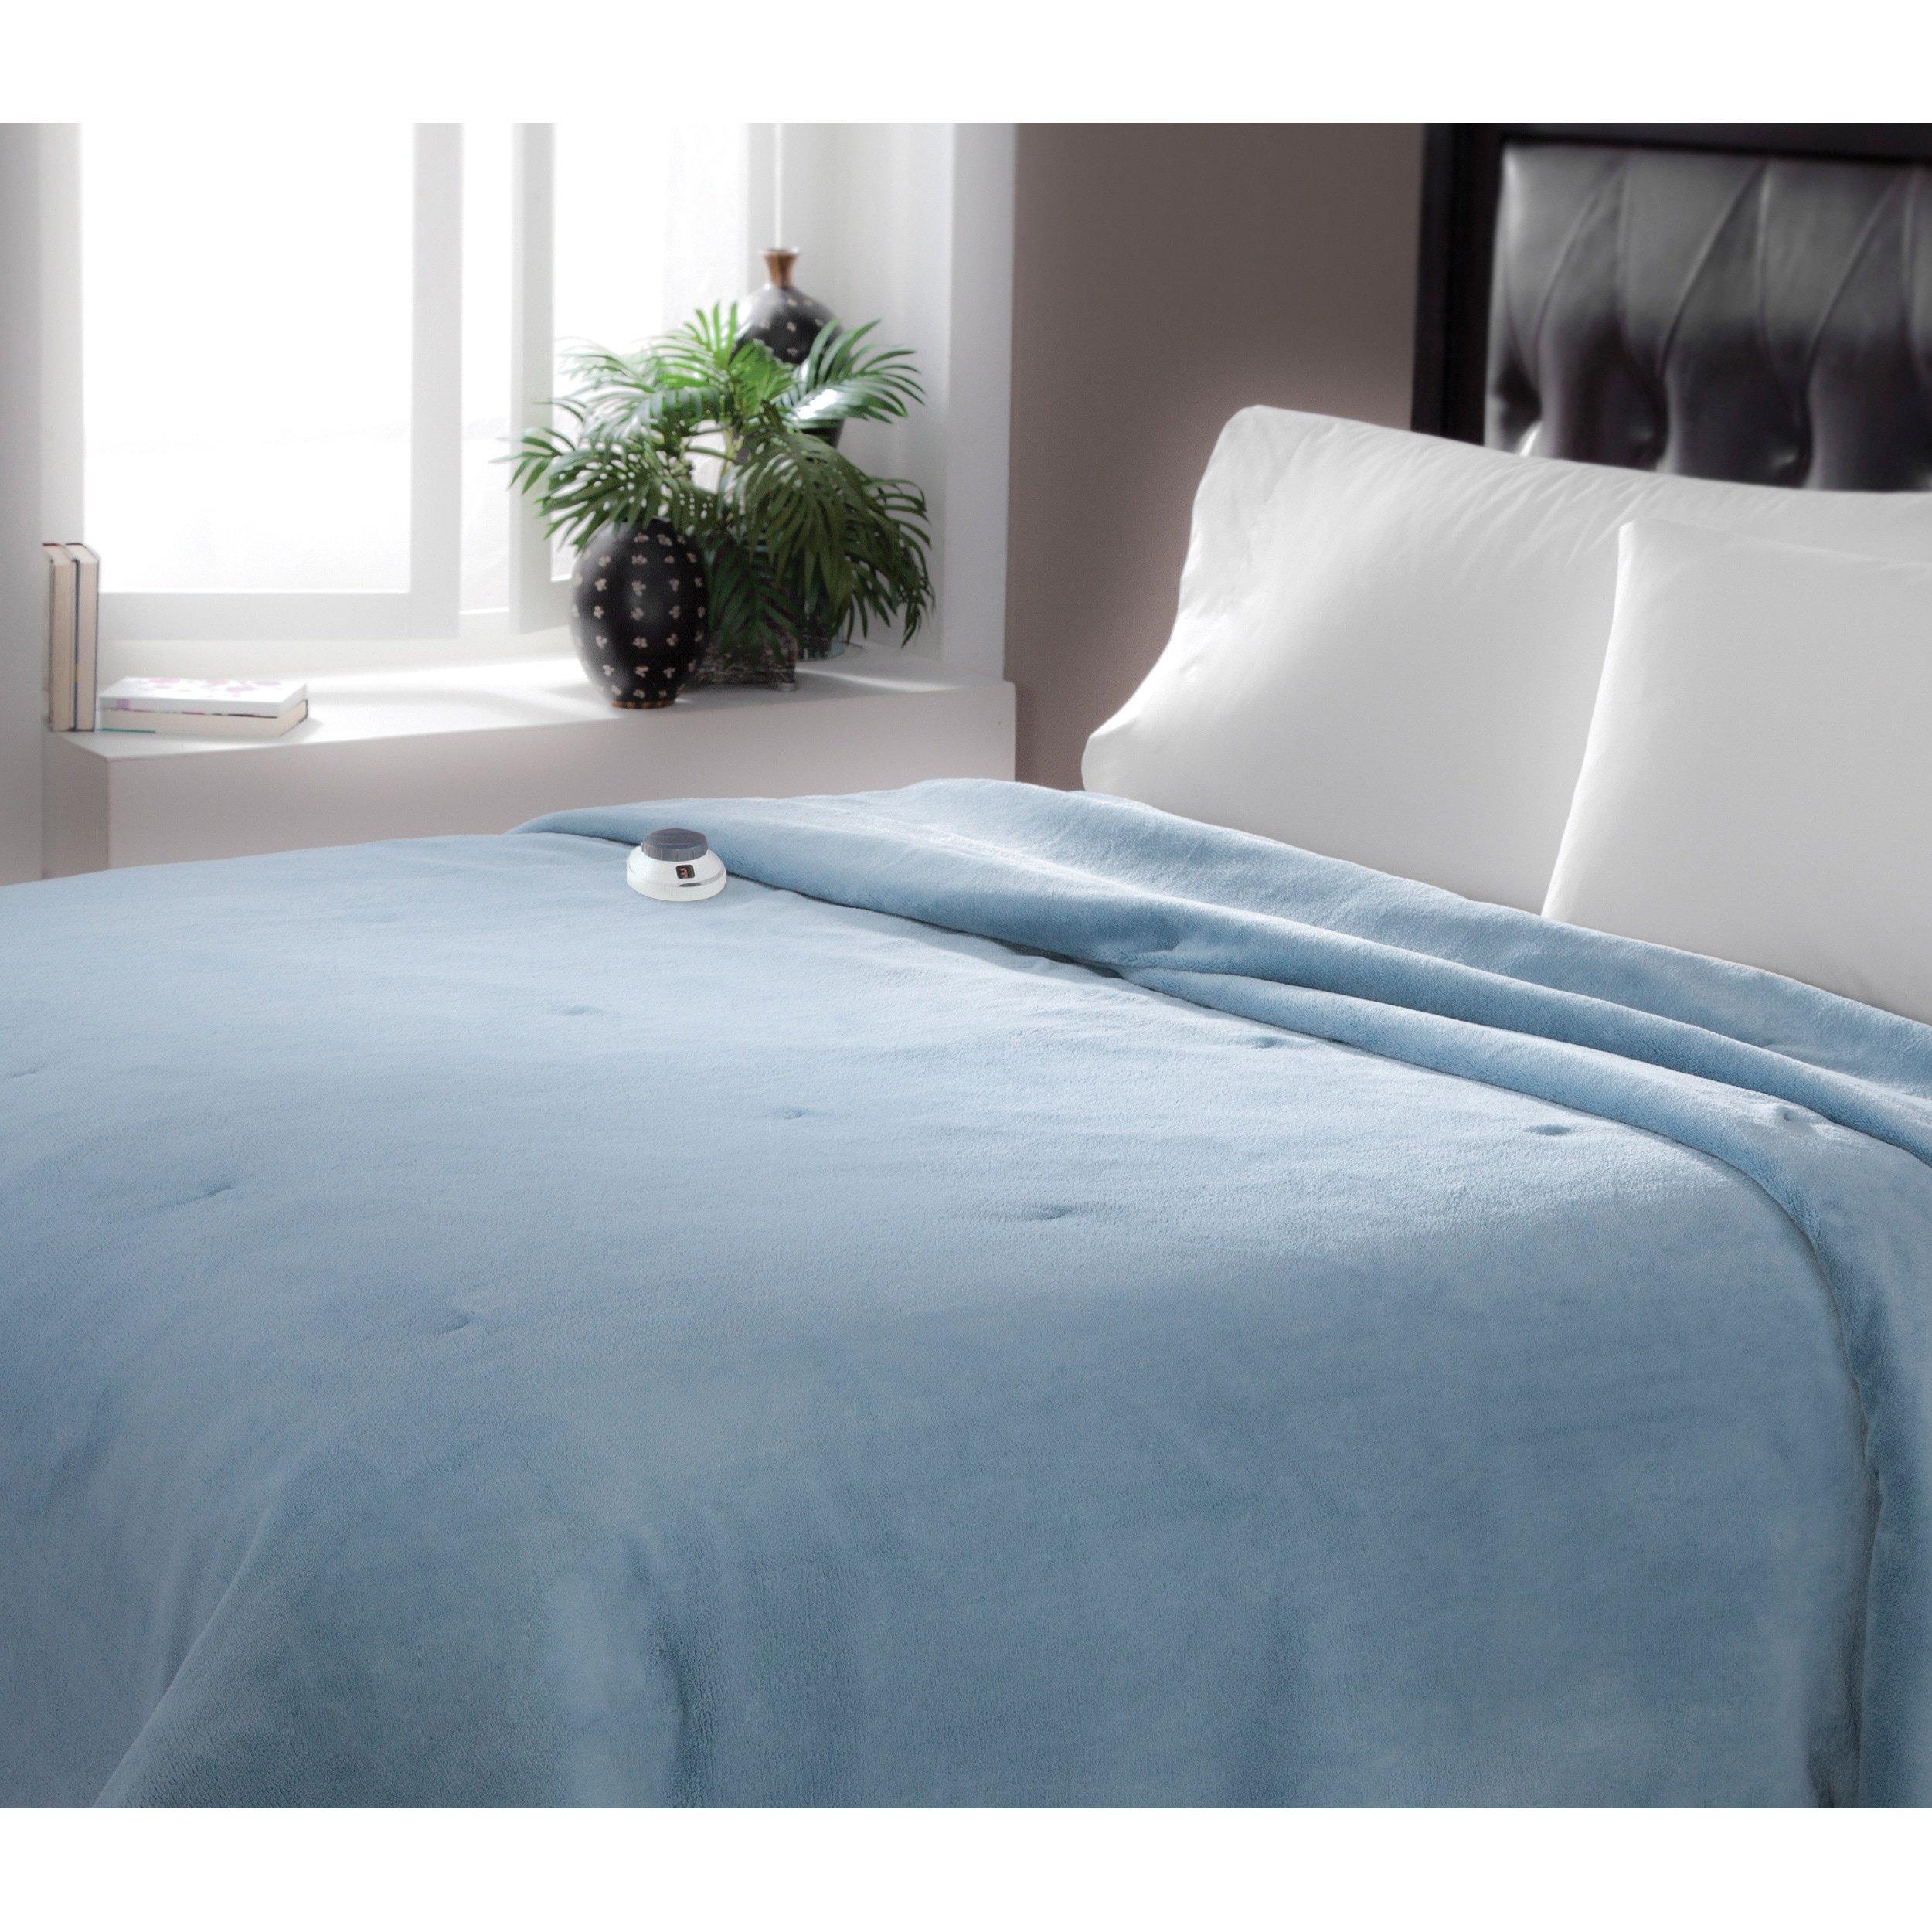 Serta Brand Soft Luxe Plush Electric Warming Blanket Brown Full